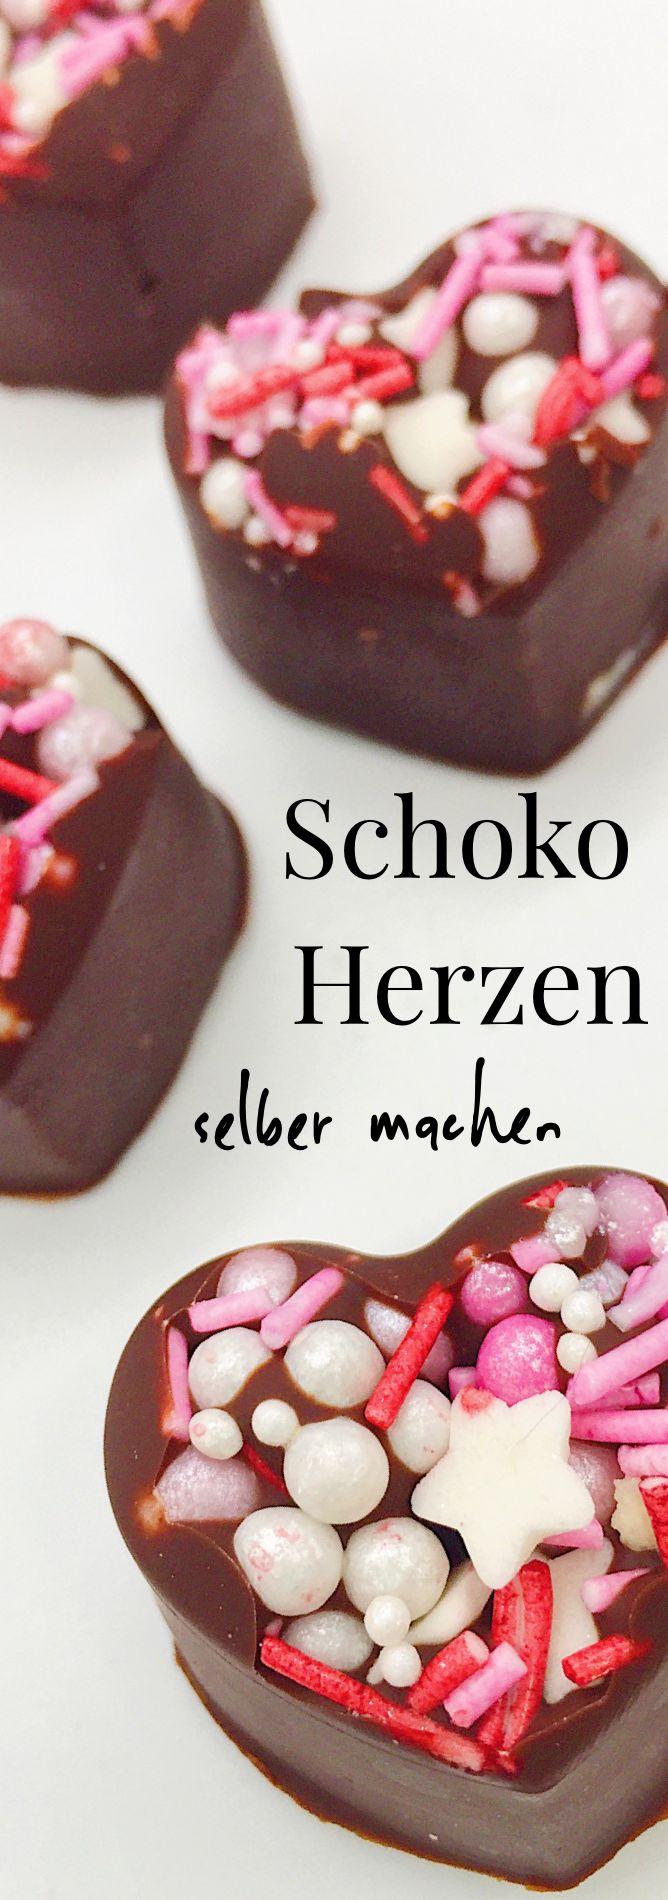 Herzen aus Schokolade selber machen – einfache Geschenkideen